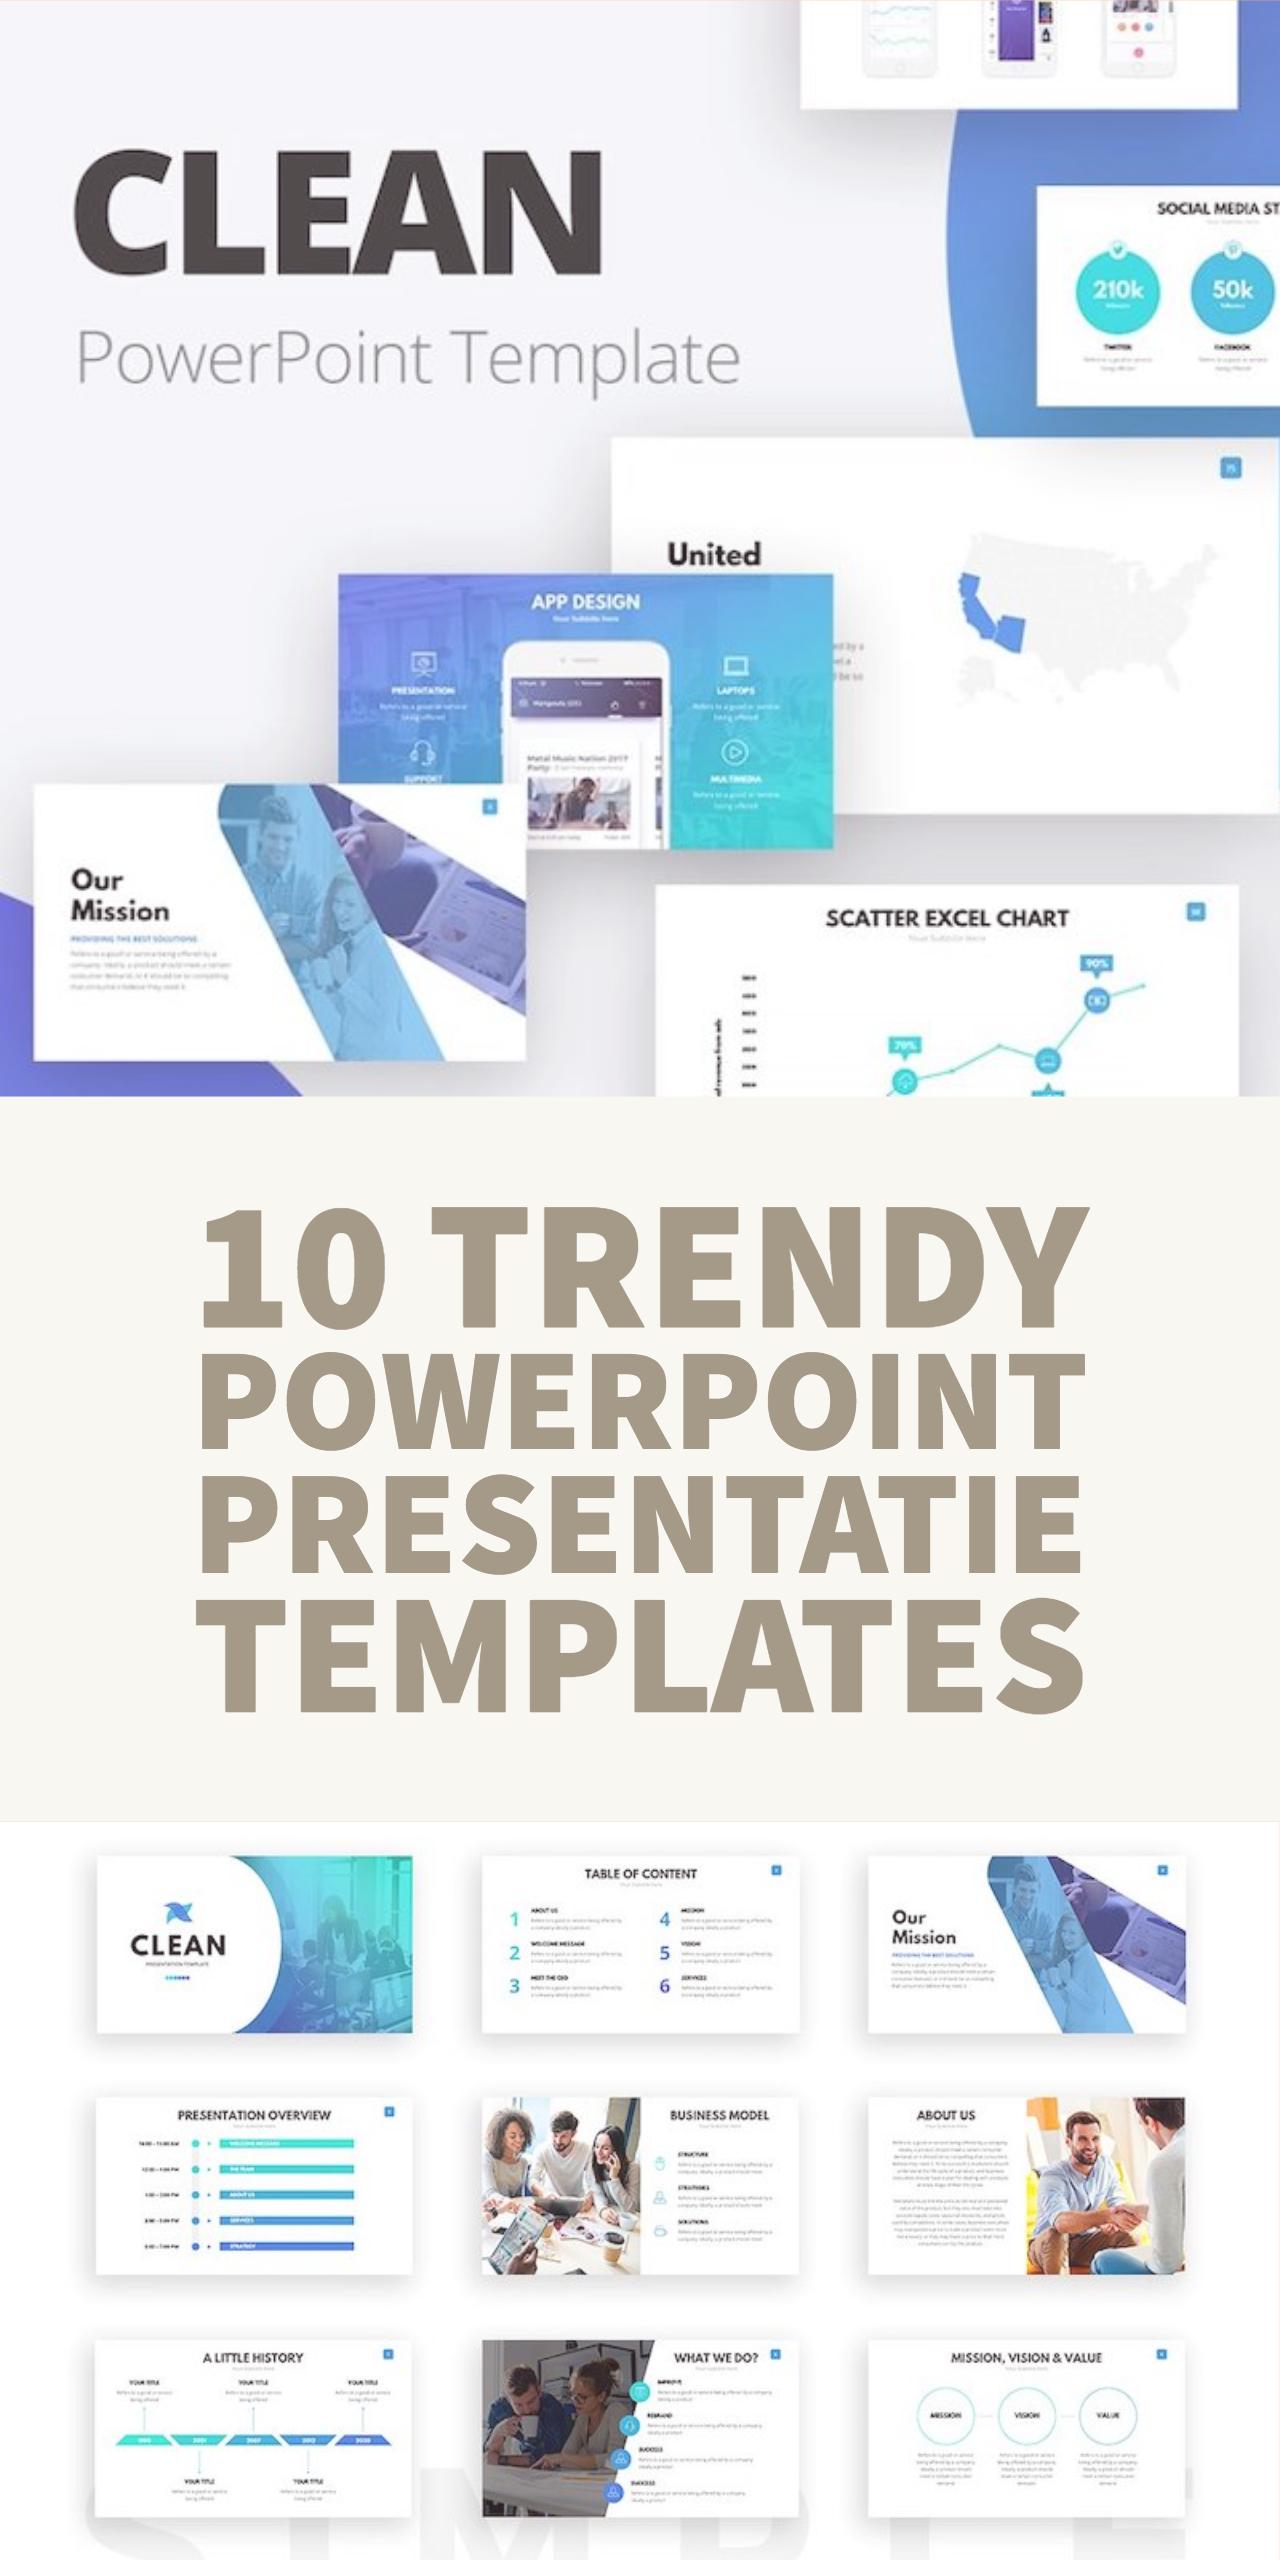 10 trendy PowerPoint presentatie templates